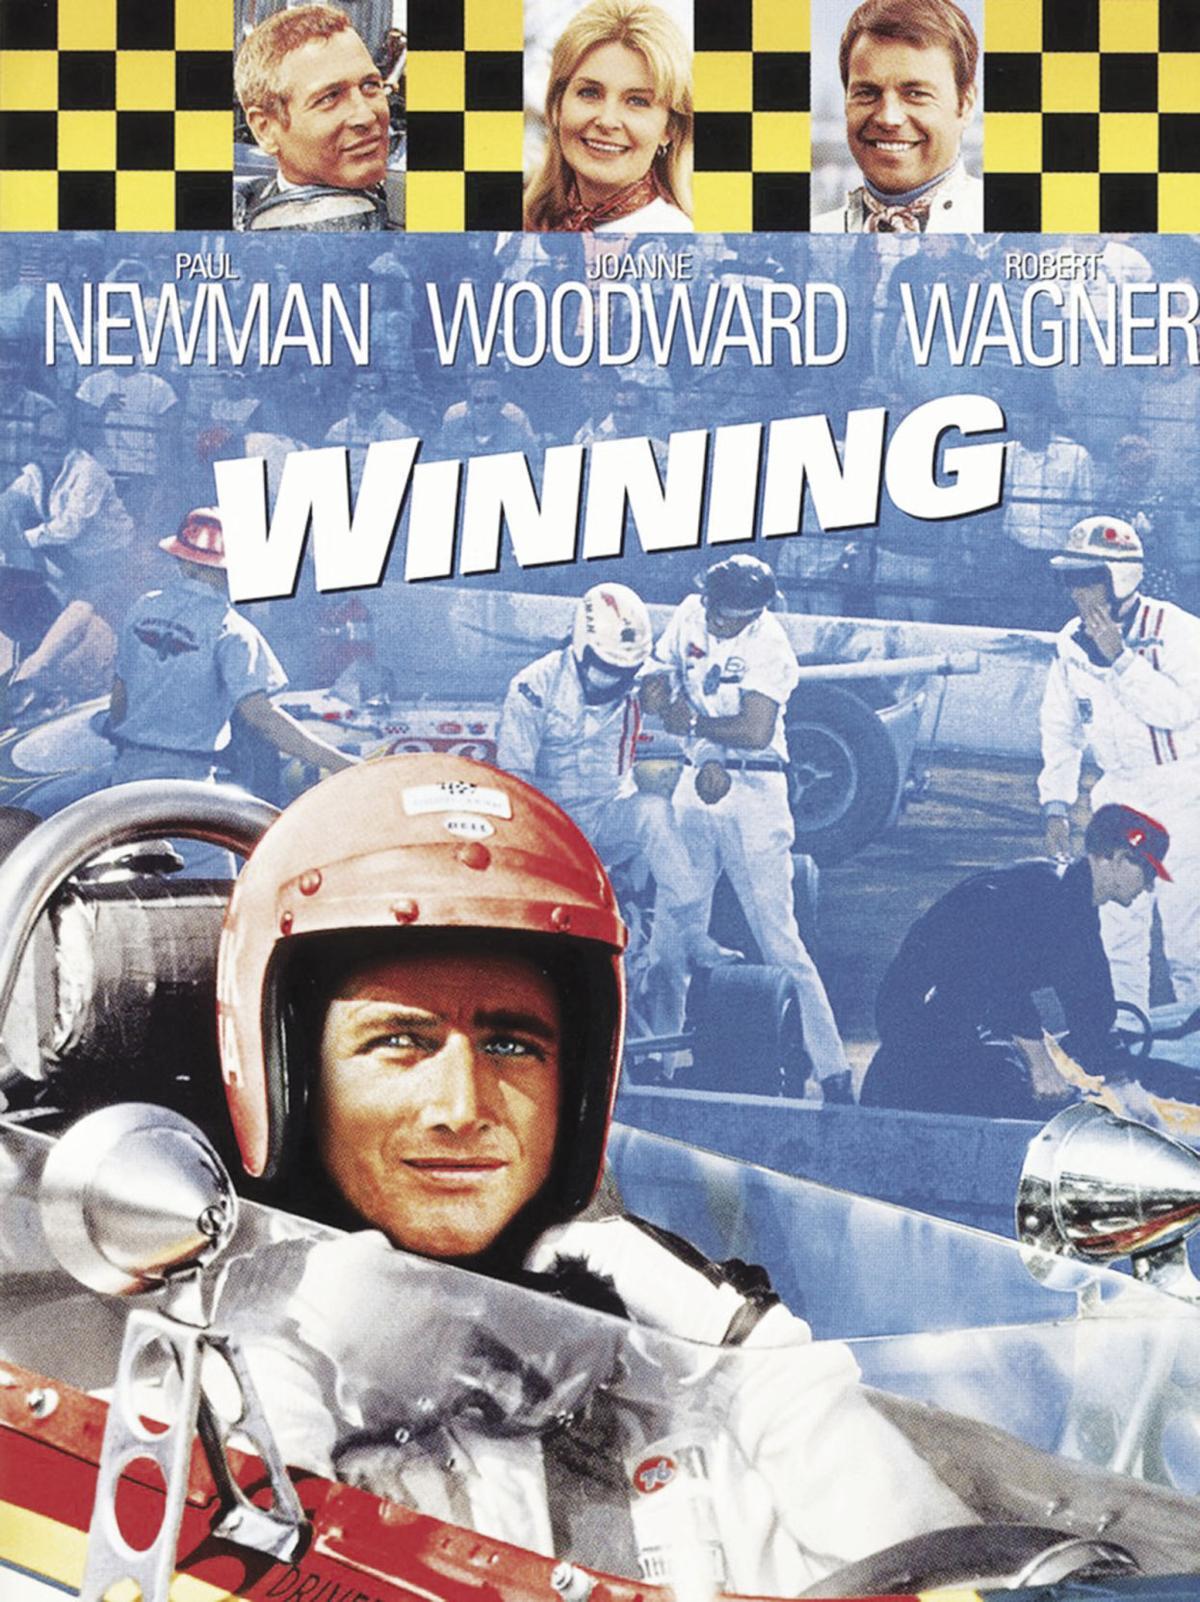 paul newman winning movie.jpg